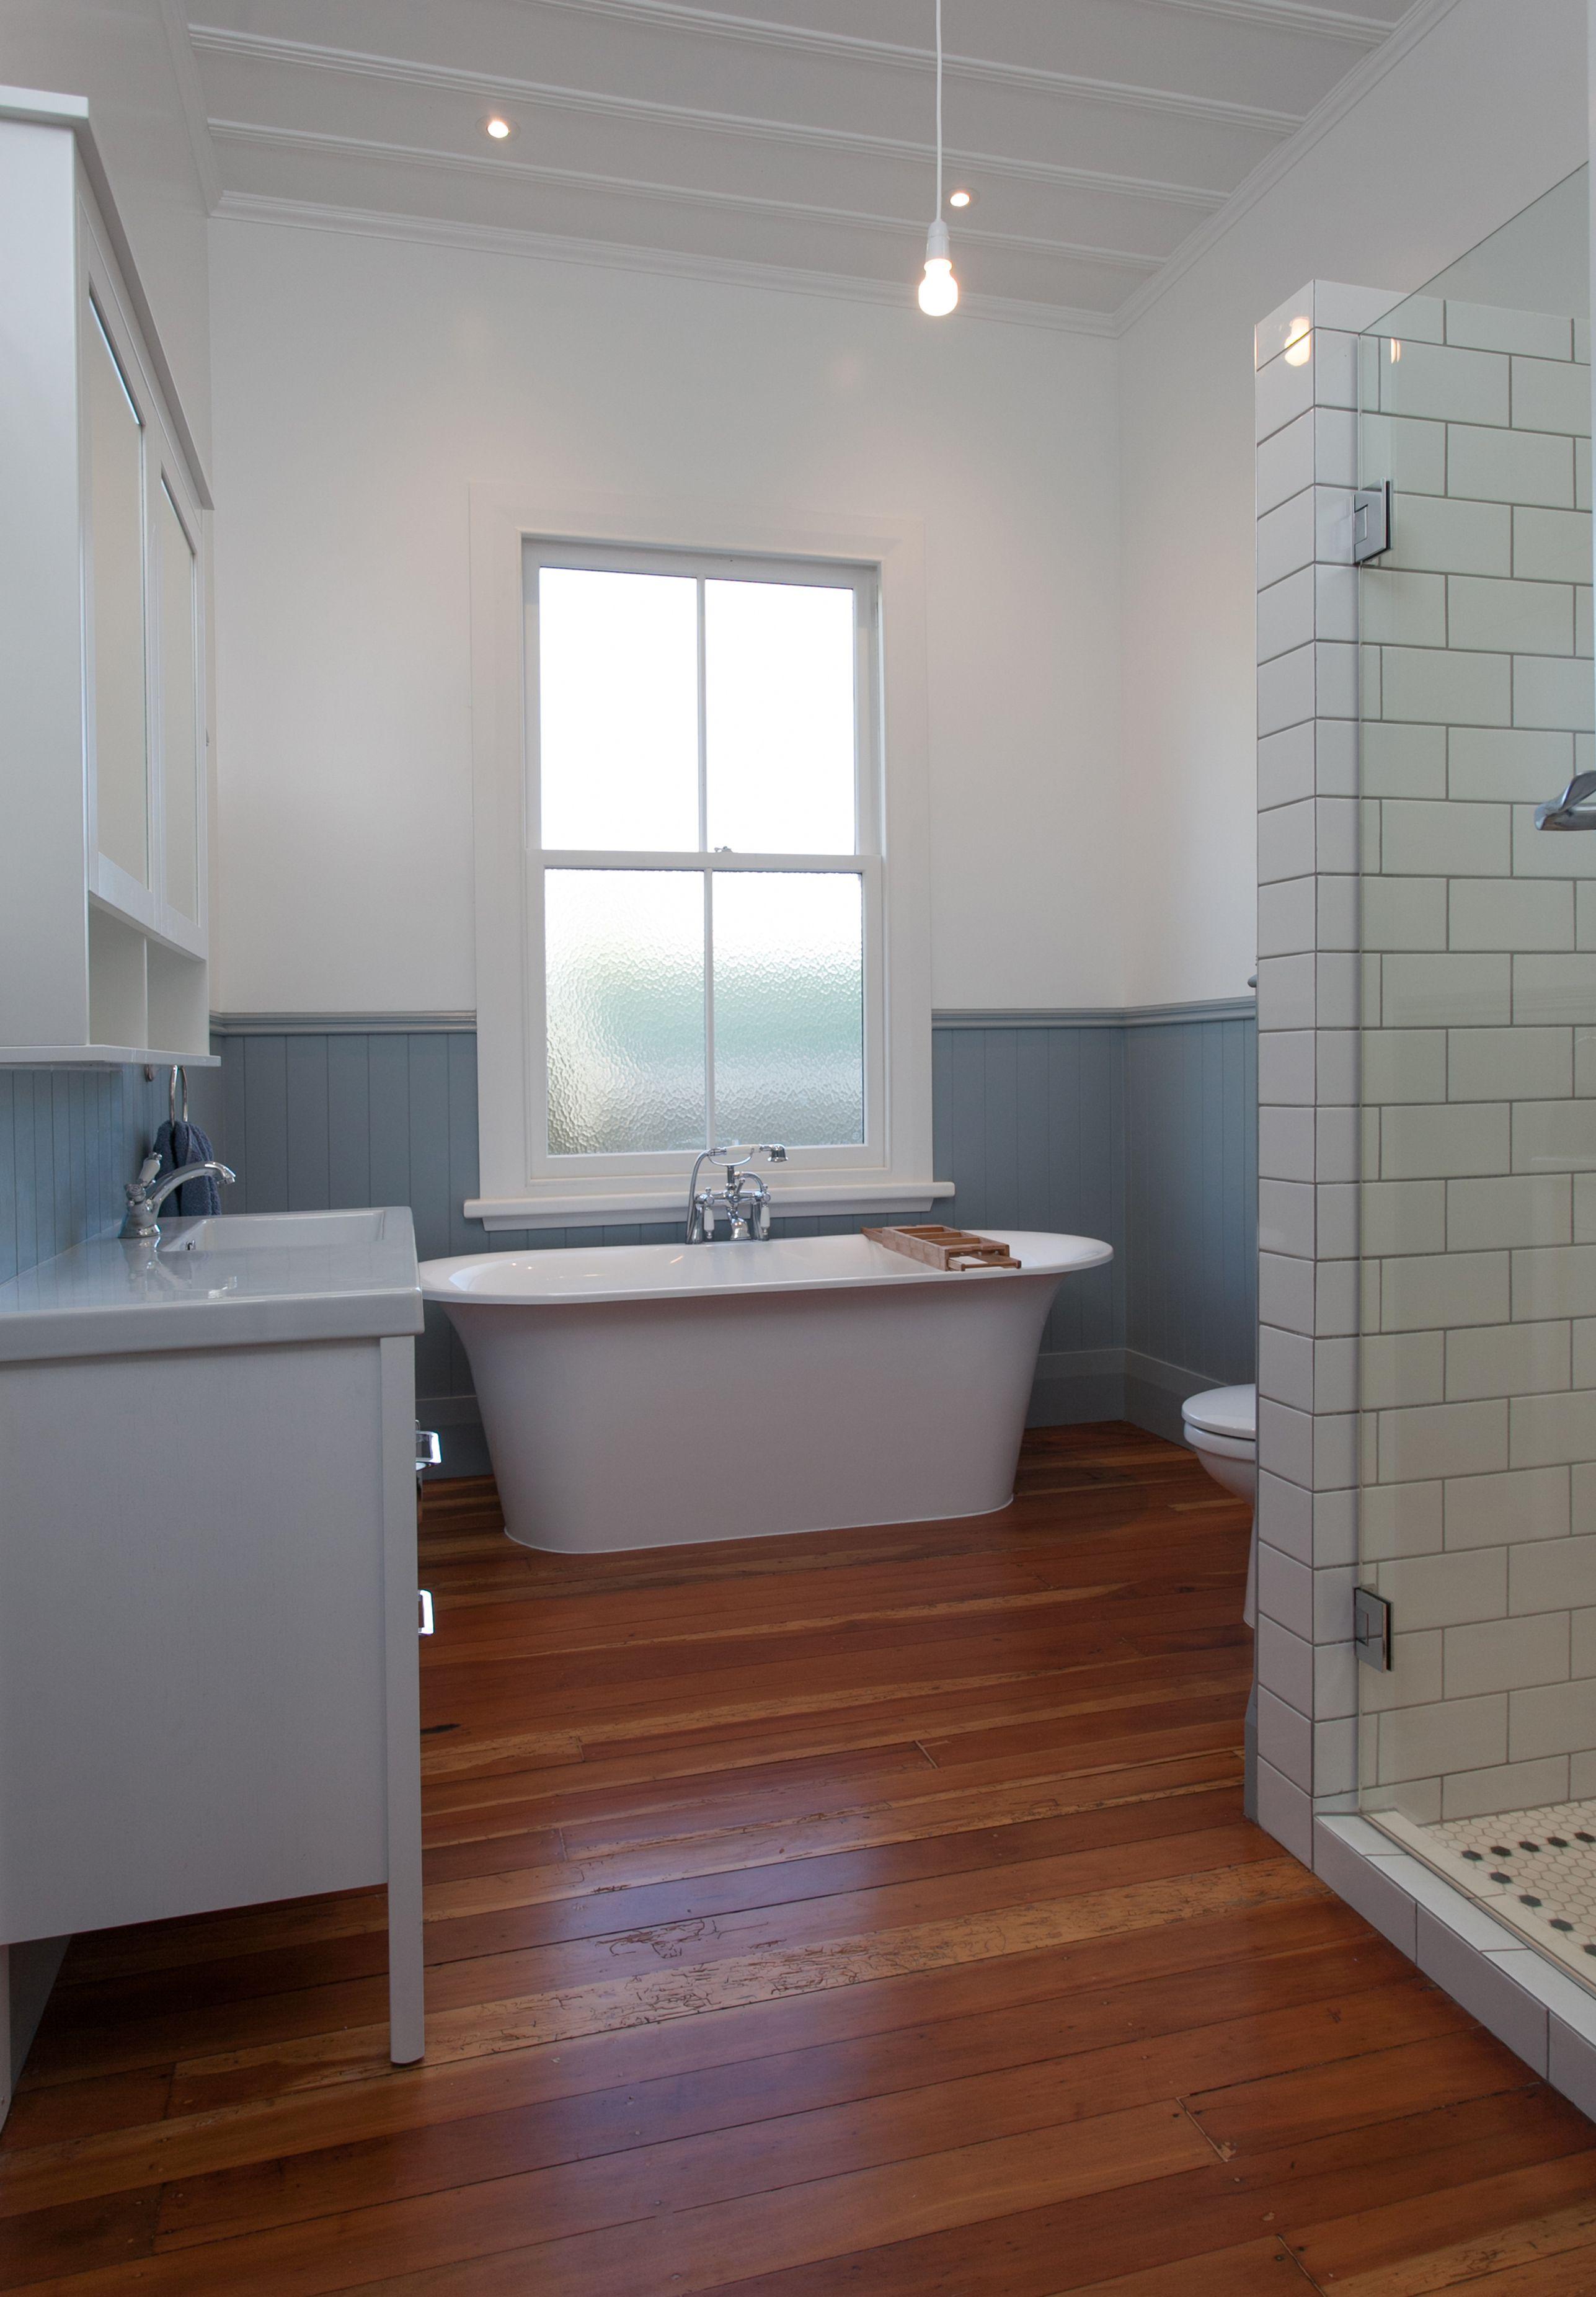 Renovated bathroom to 1900's Villa Cambridge, New